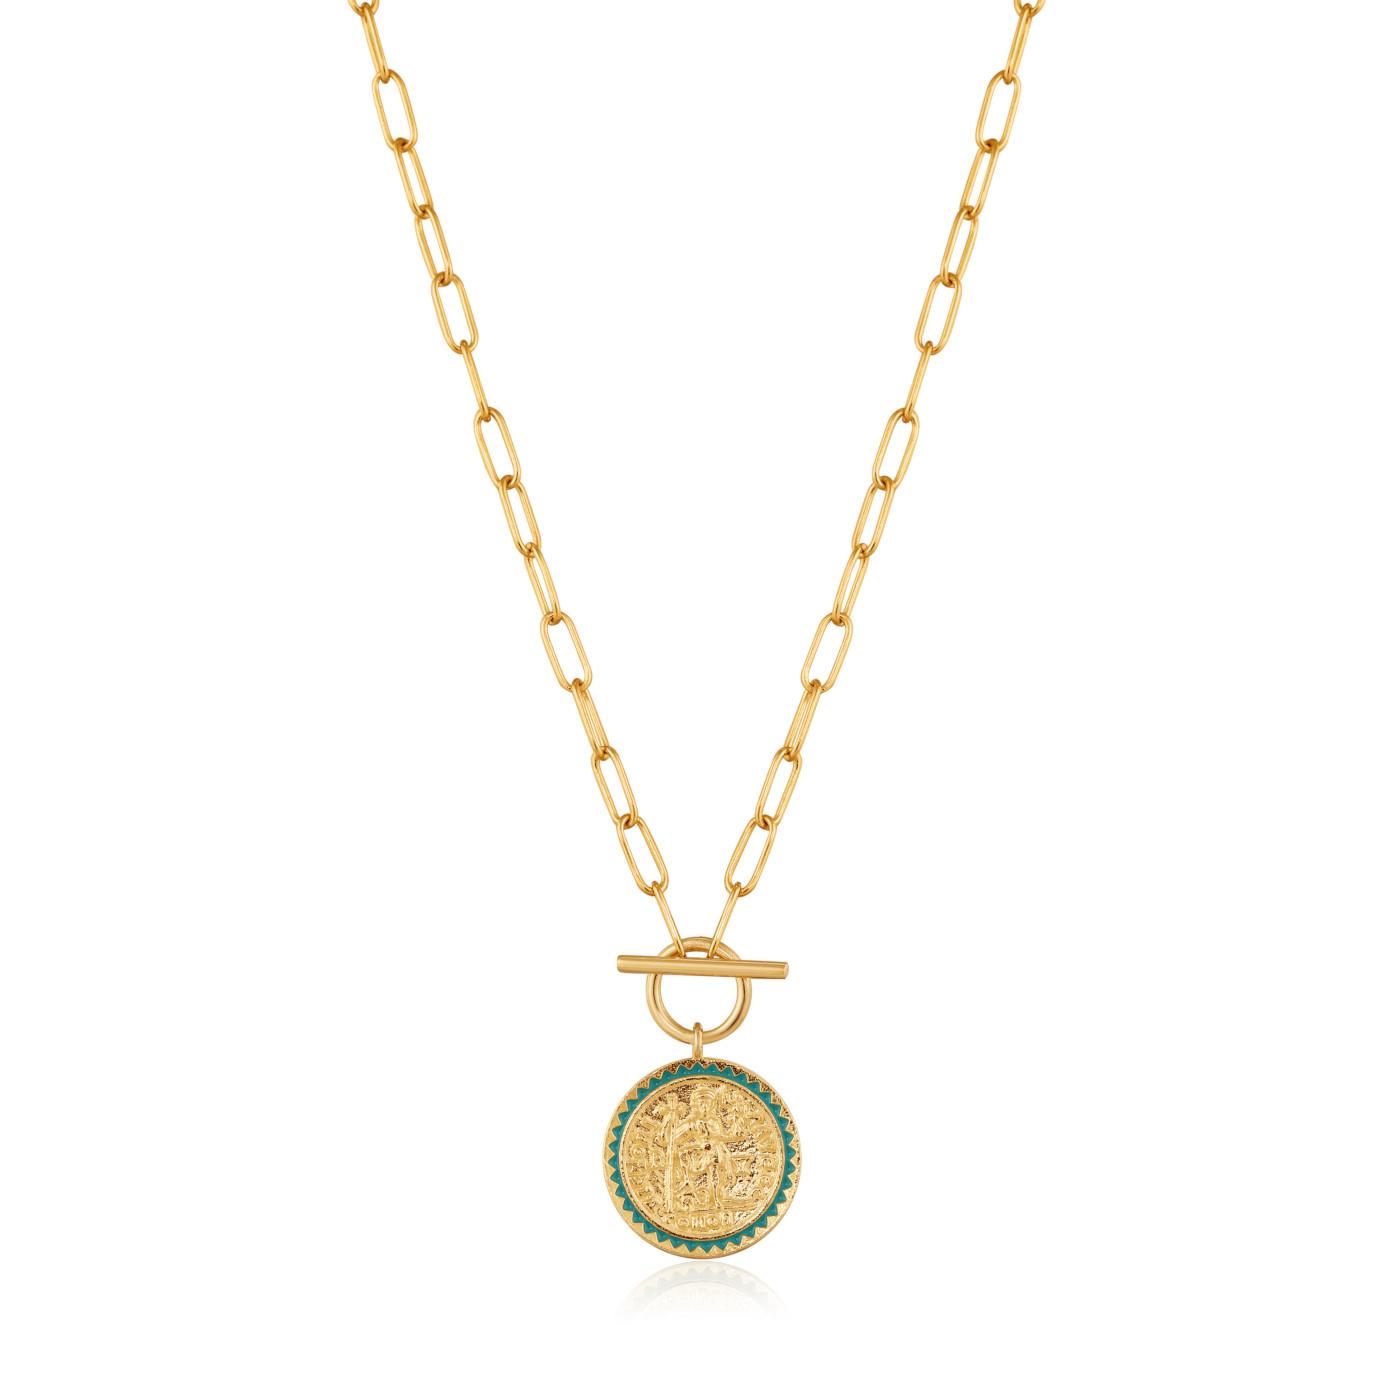 Ania Haie 925 Sterling Zilveren Gold Digger Emperor Collier AH-N020-05G (Lengte: 38.00 cm)